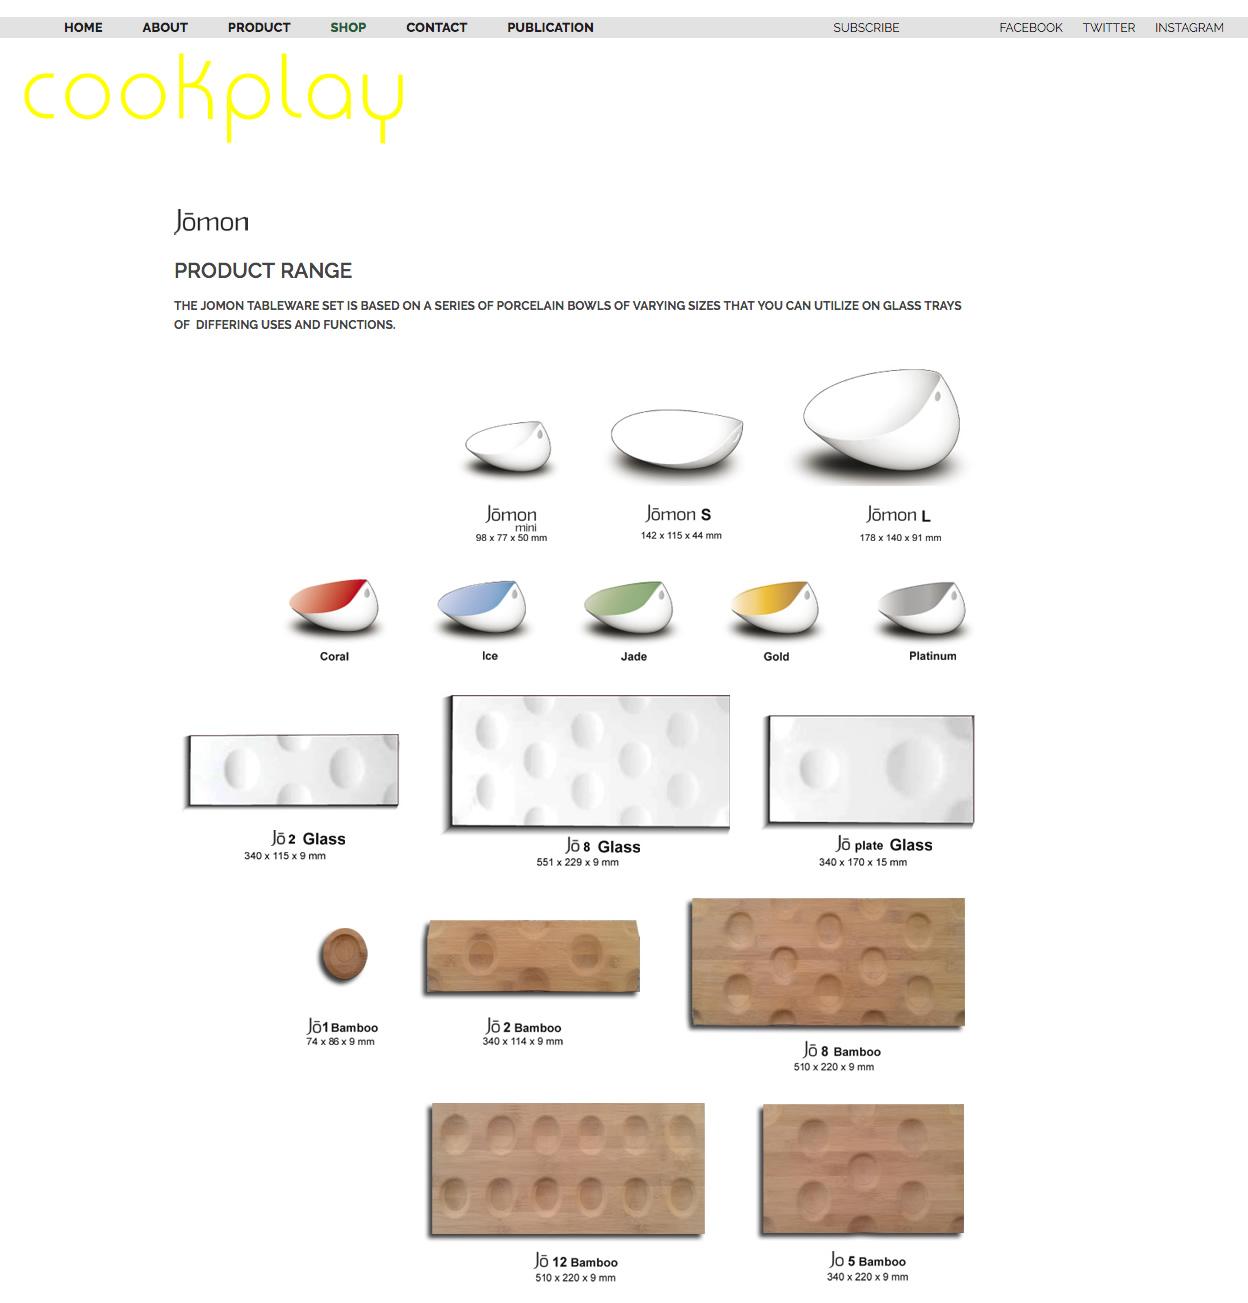 Cookplay shop